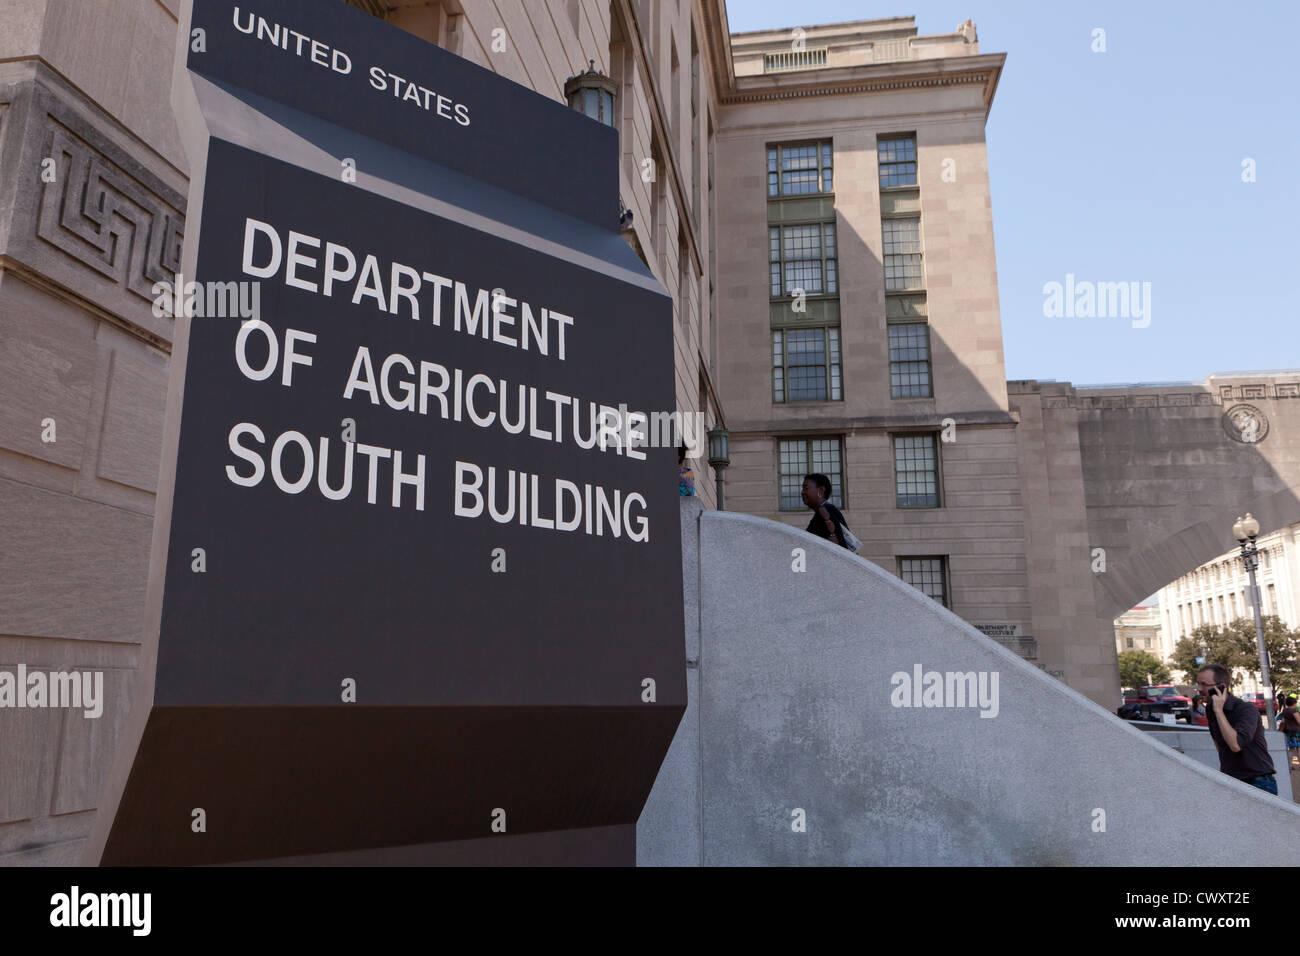 US Department of Agriculture headquarters - Washington DC, Stati Uniti d'America Immagini Stock